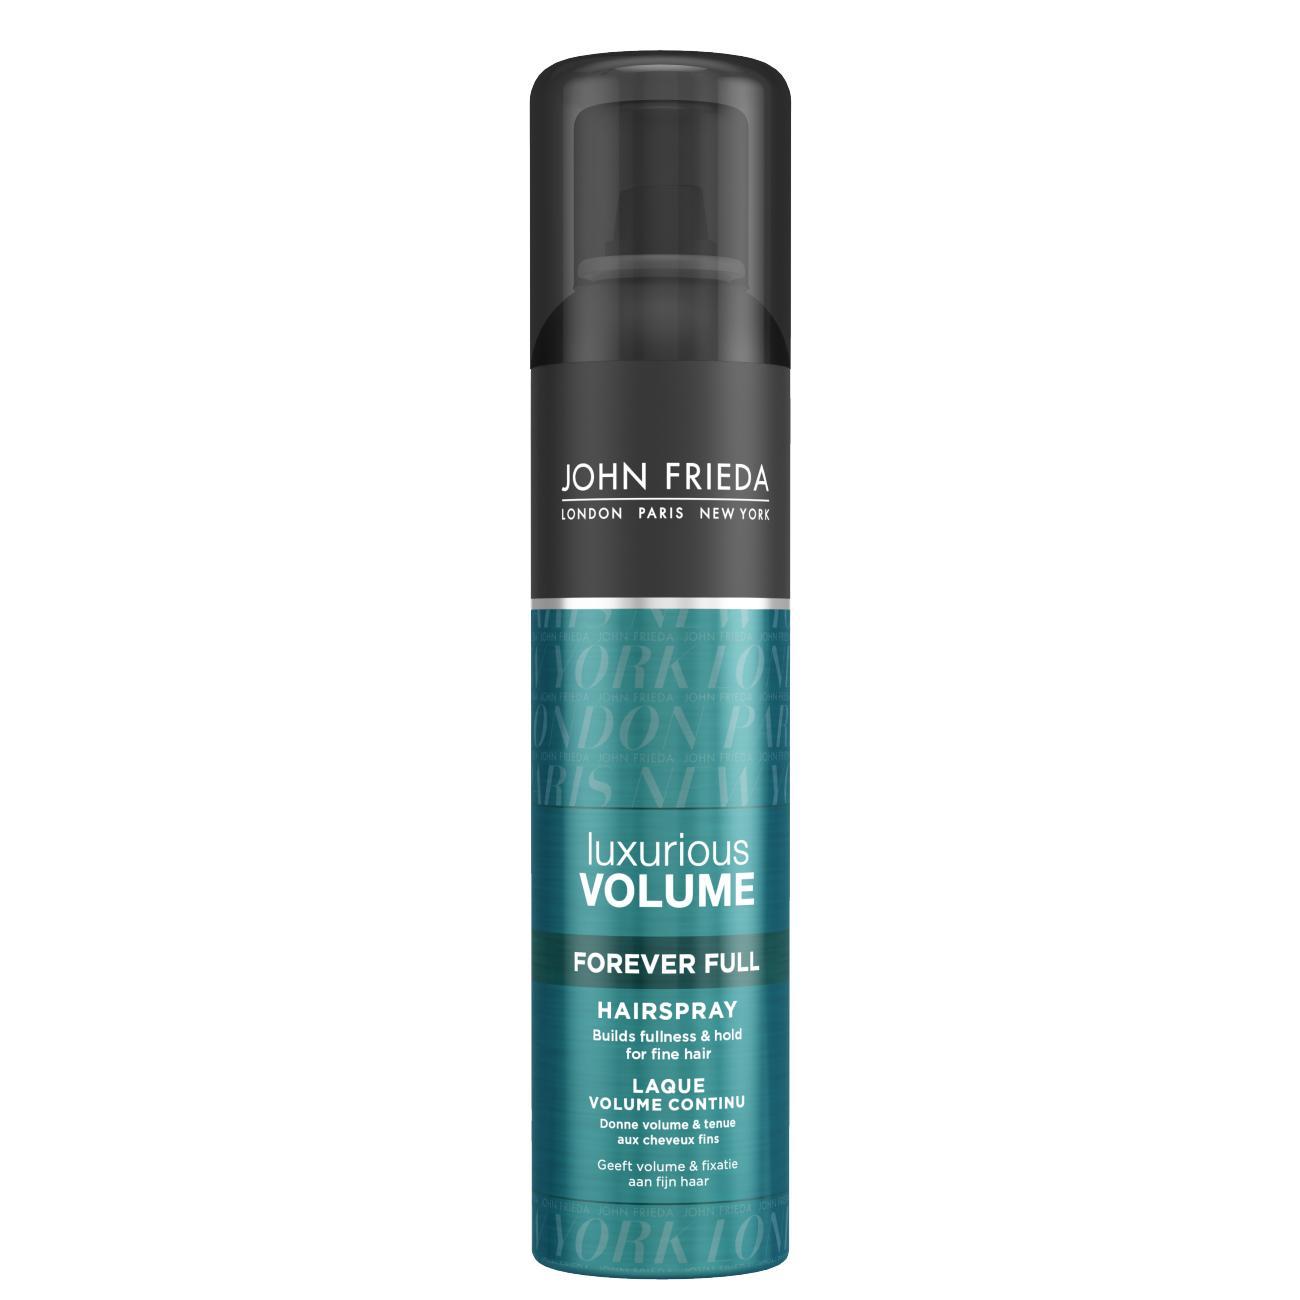 ��� ��� ����� John Frieda Luxurious Volume 24 ���� ����� � �������� 250 ��